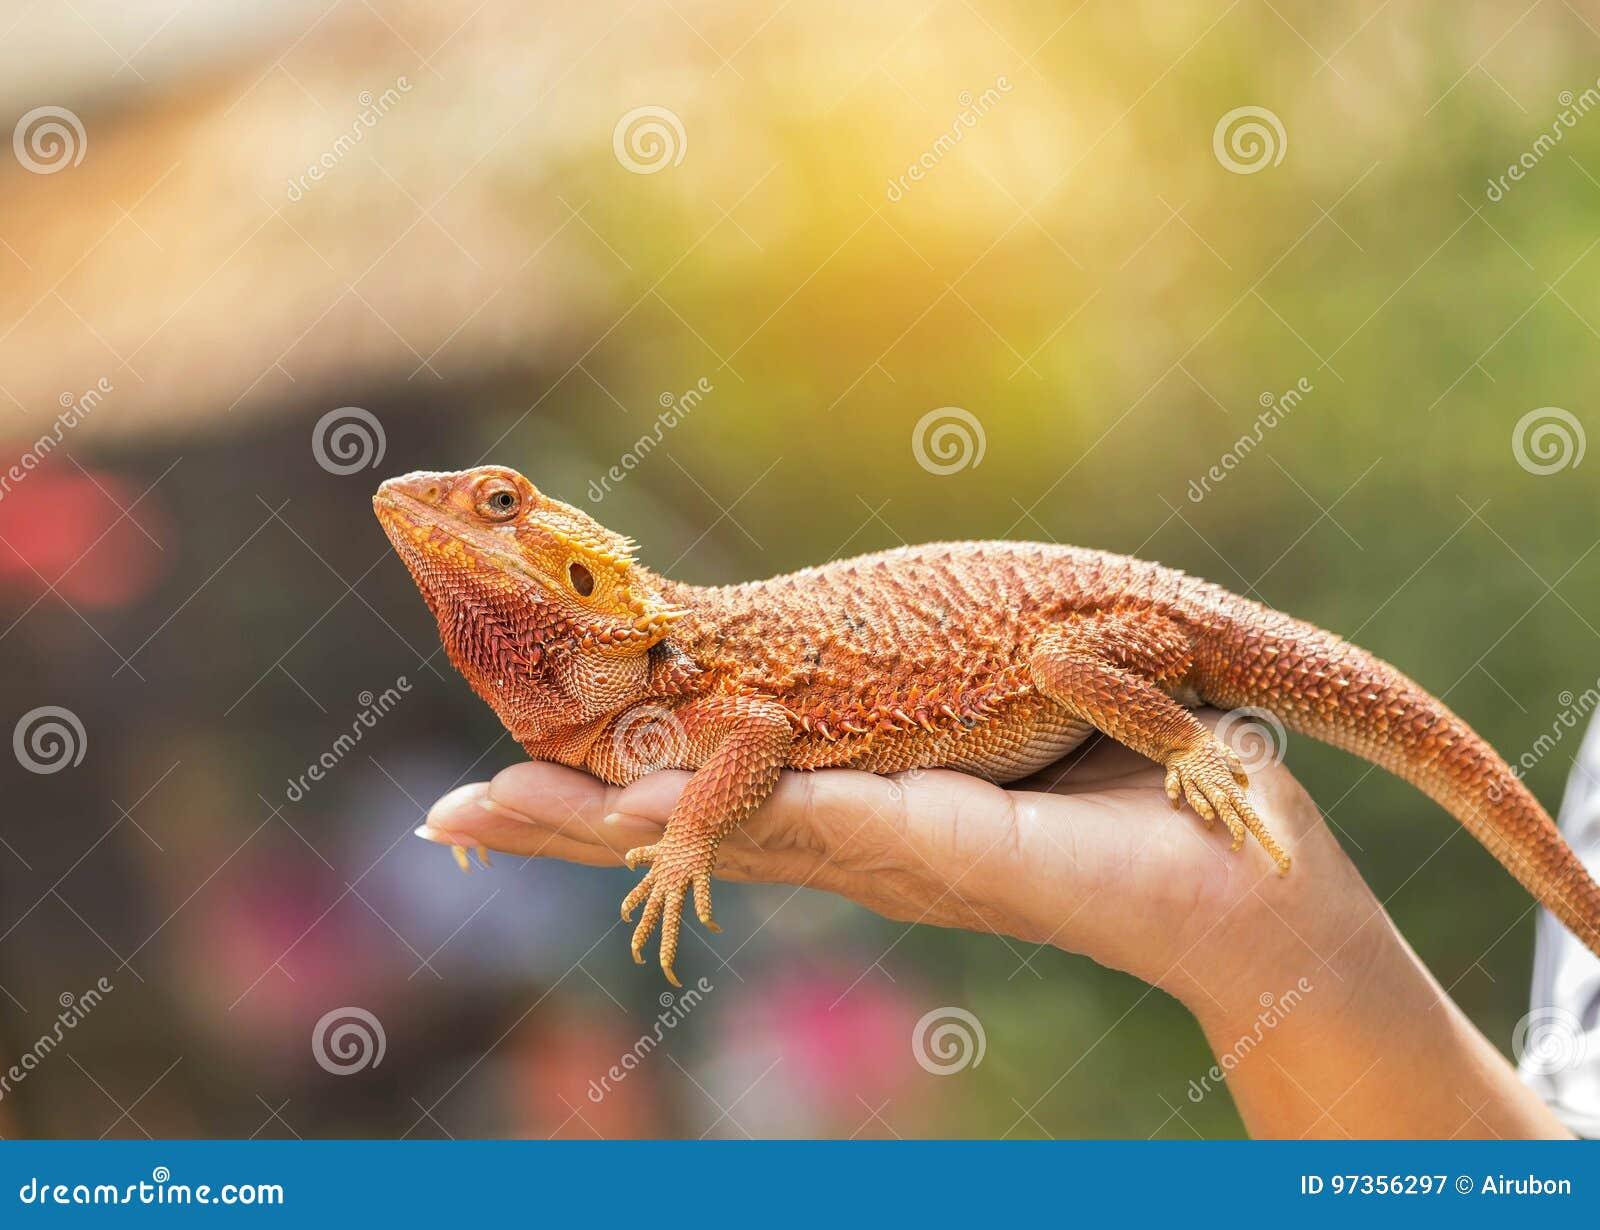 Download Close Up Bearded Dragon Pogona Vitticeps Australian Lizard On Hand Stock Image - Image of creeper, head: 97356297